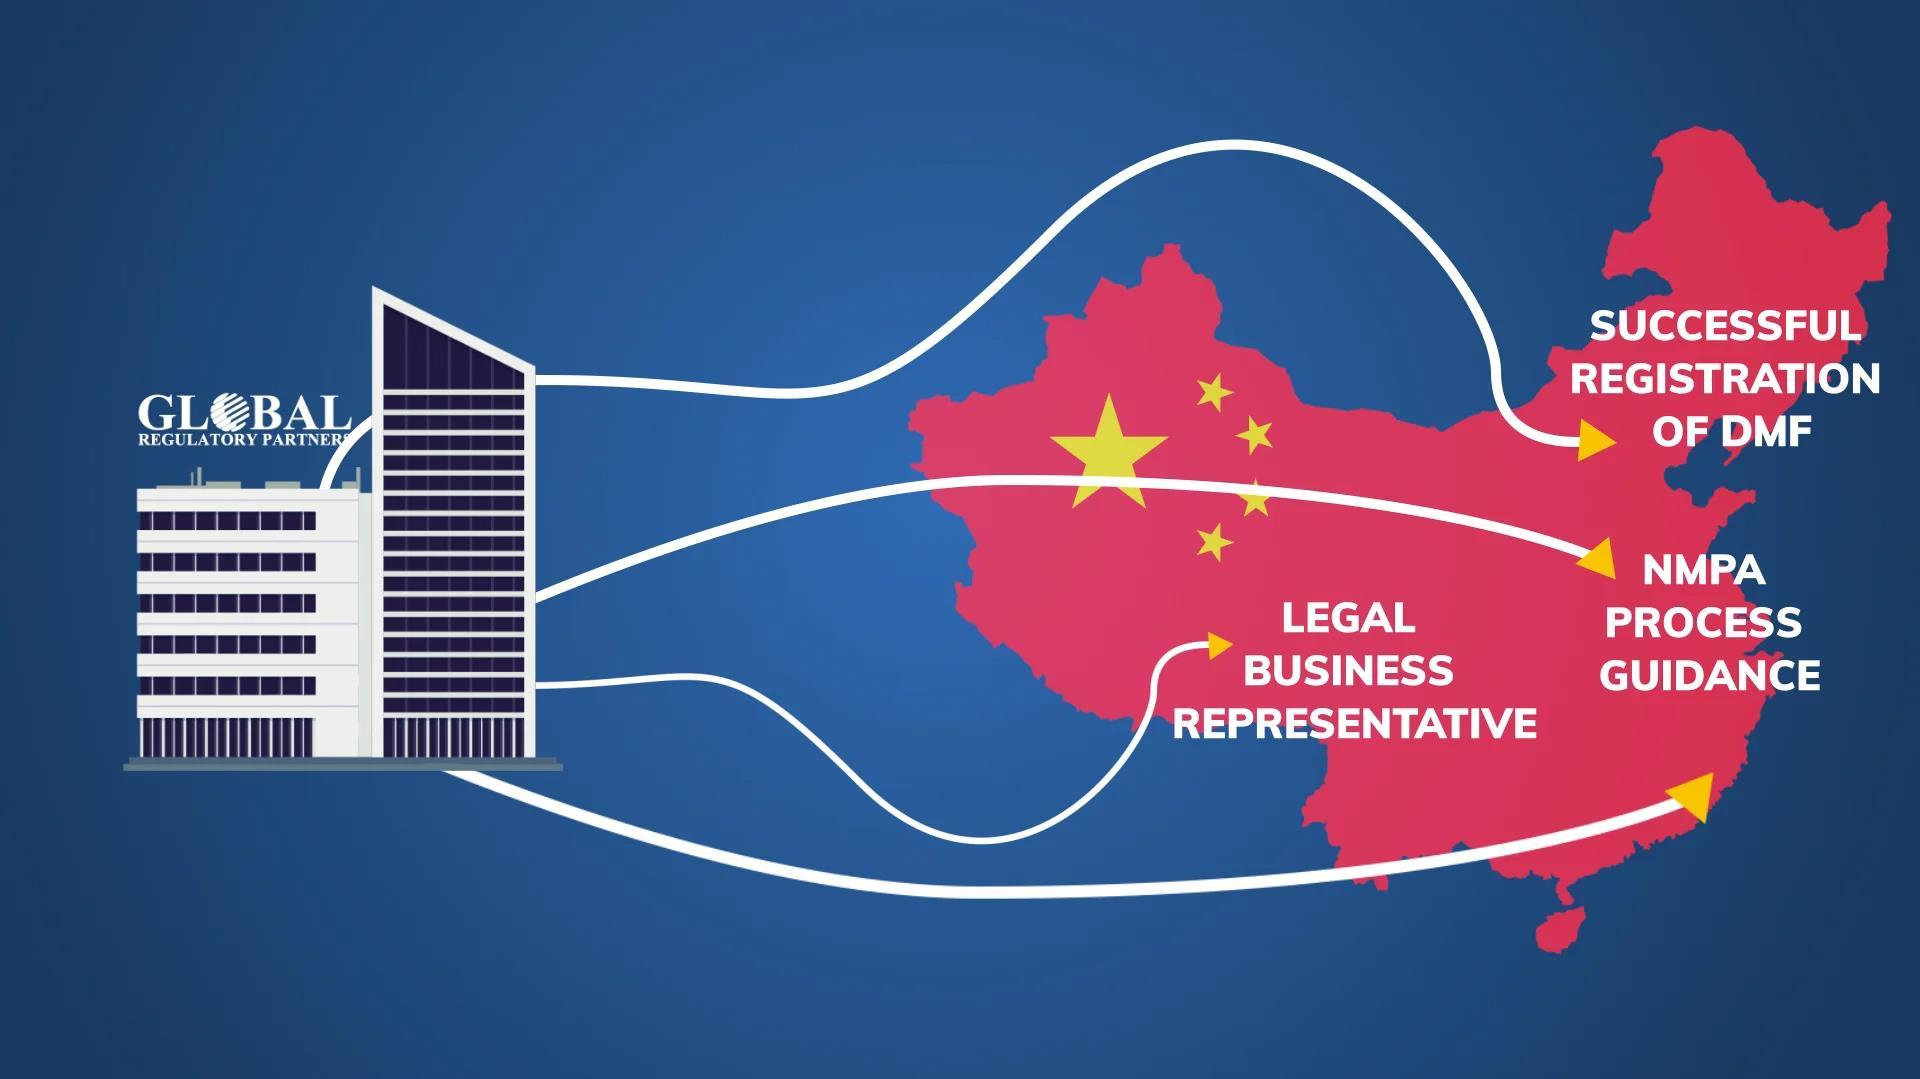 DMF Registration in China video